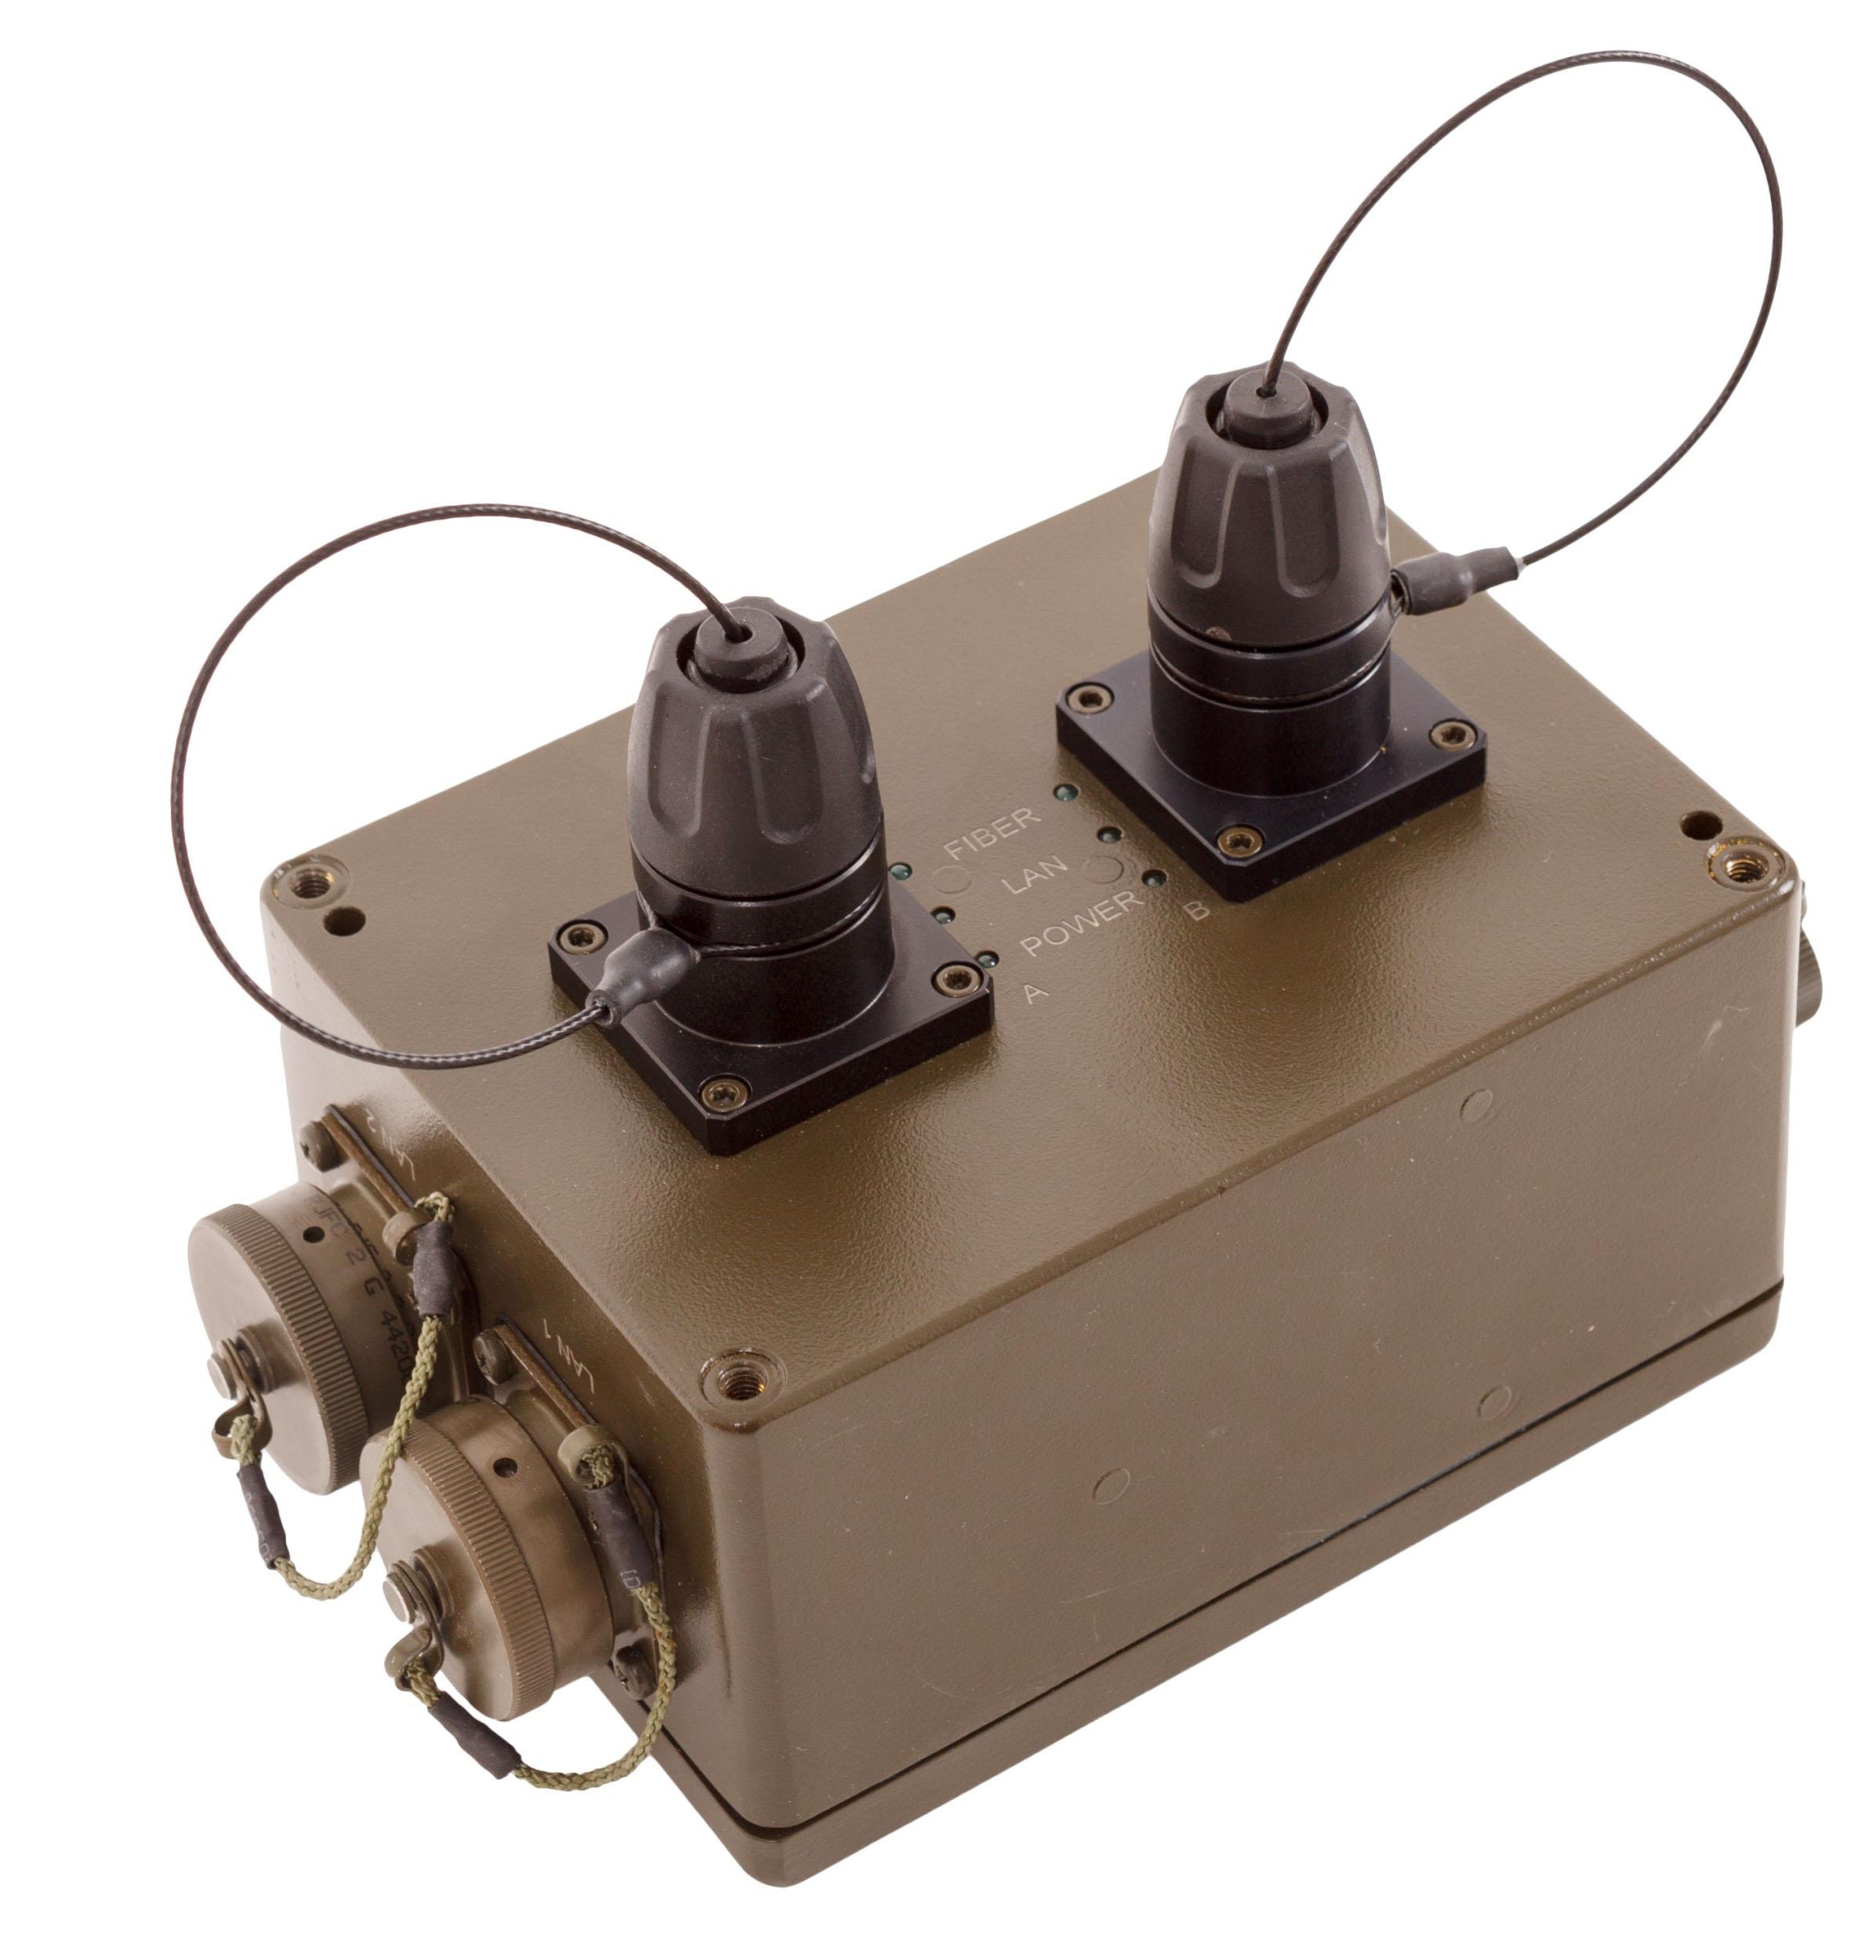 LMC-02.GF Gigabit Ethernet Media Converter Ruggedized type